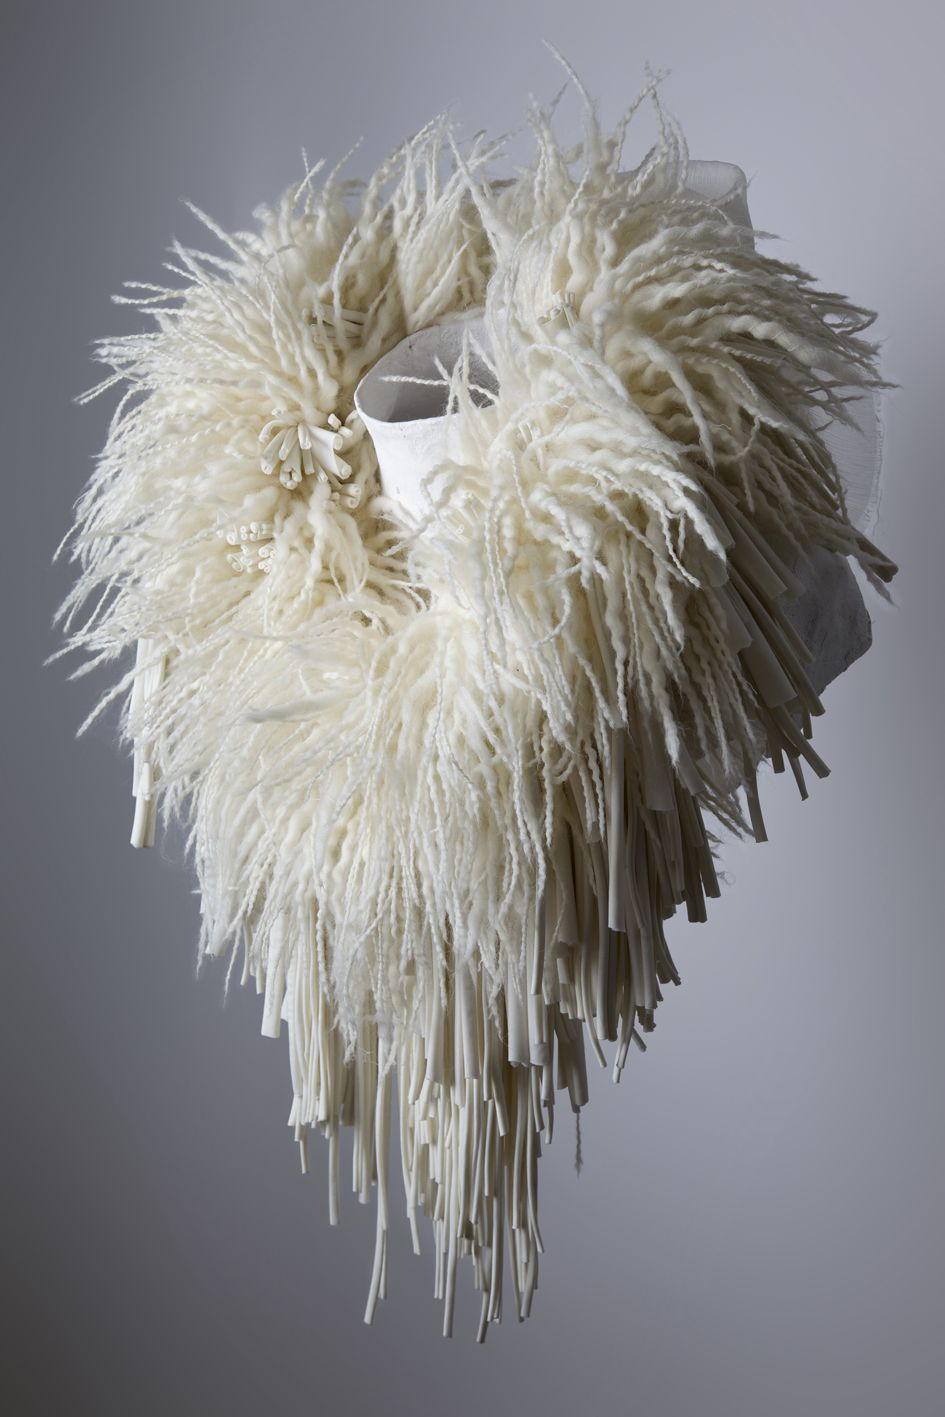 Neckpice Rowan Mersh Rossana Orlandi Textile